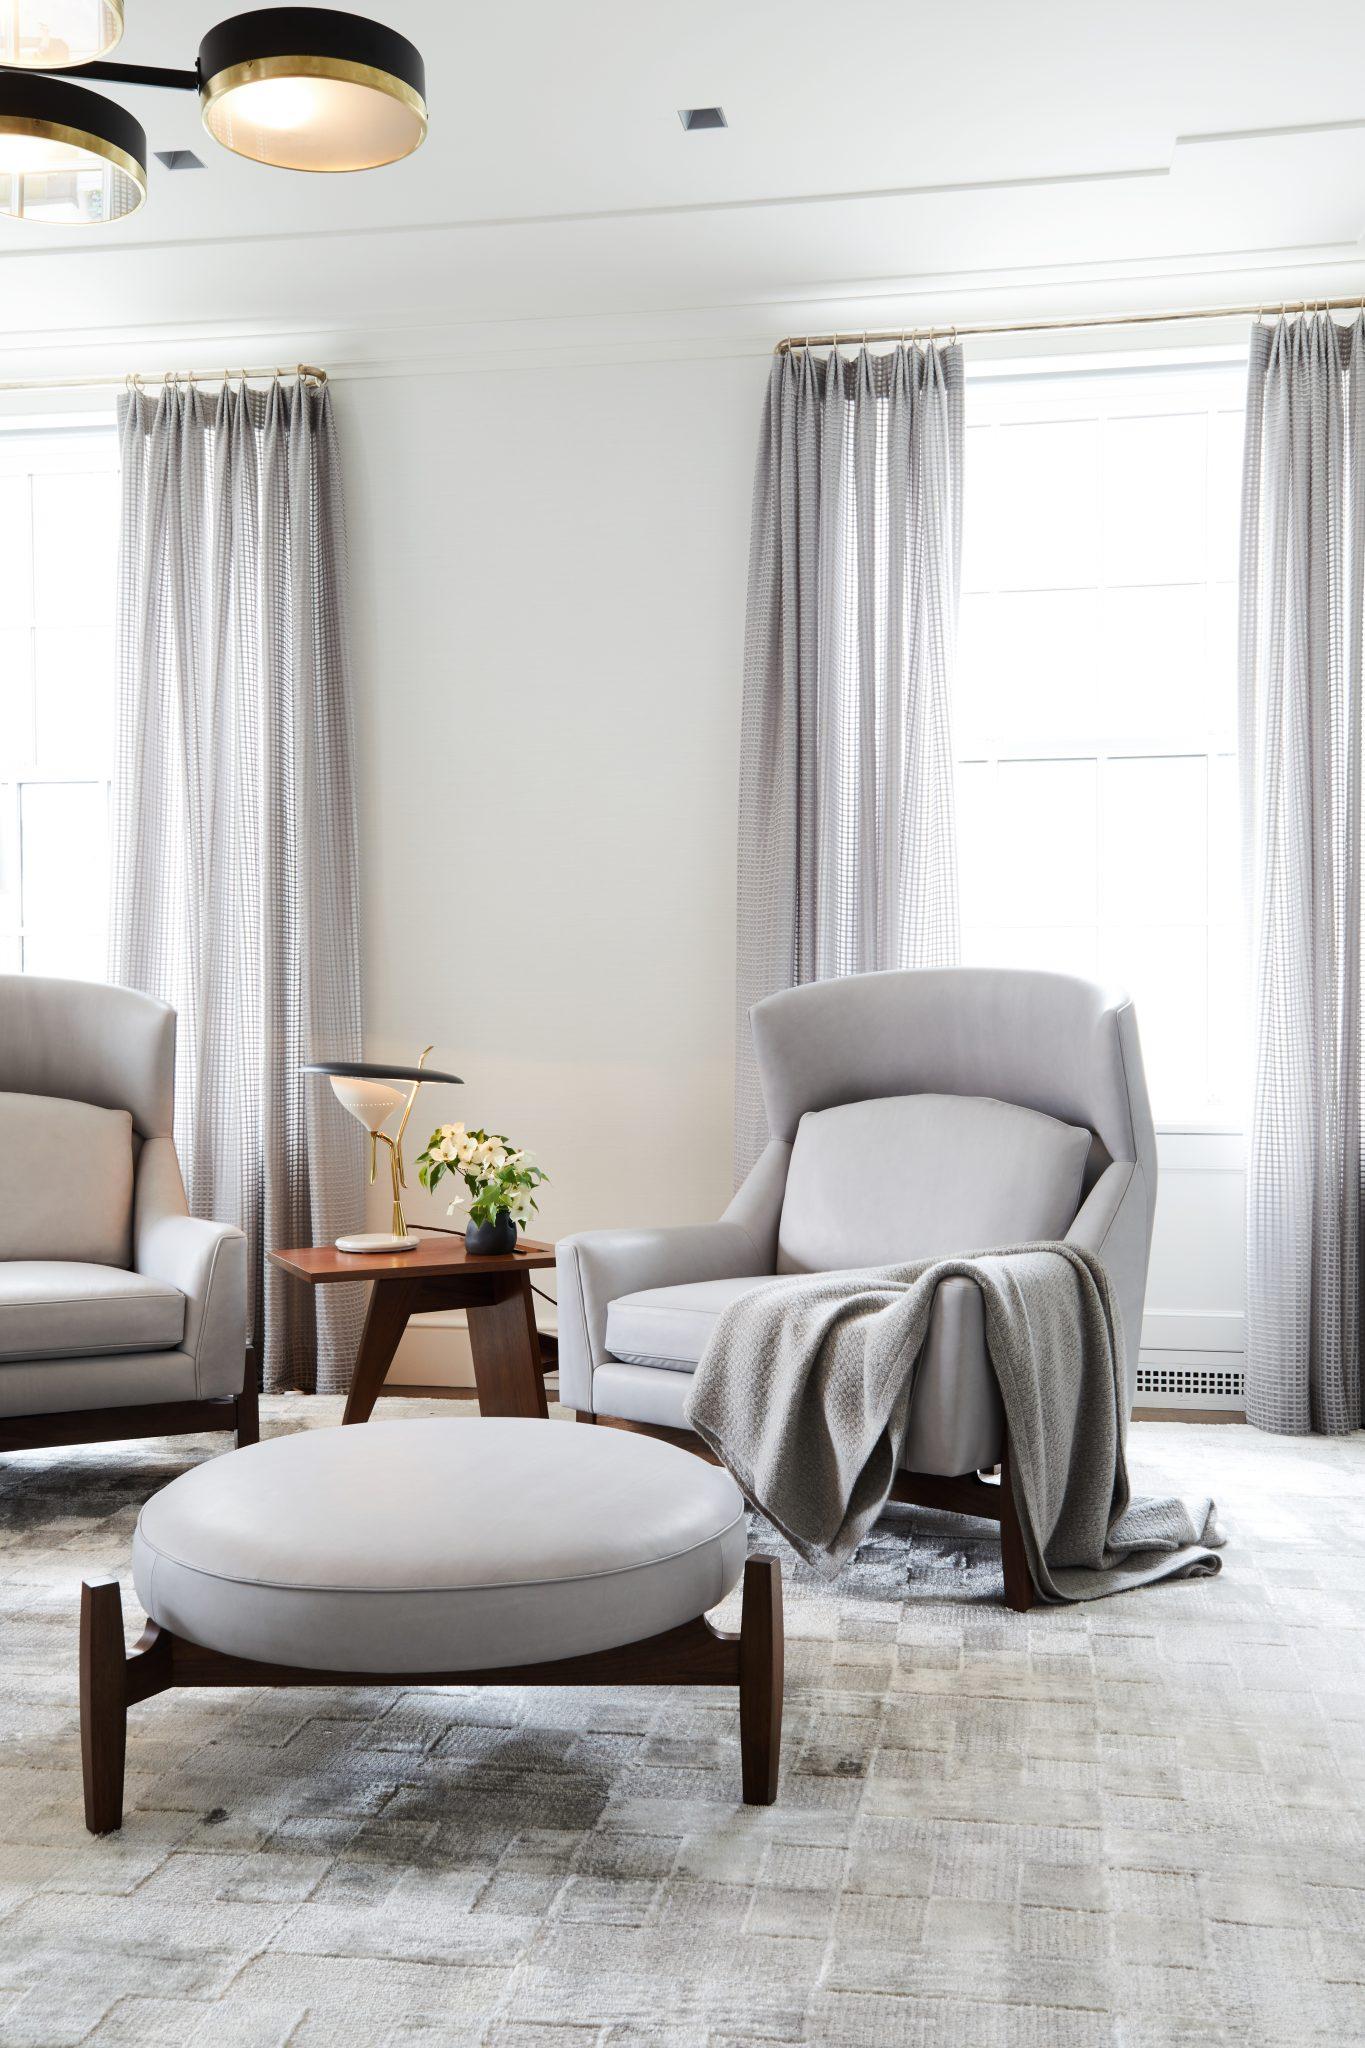 Classic Contemporary Park Avenue Apartment | Ronen Lev